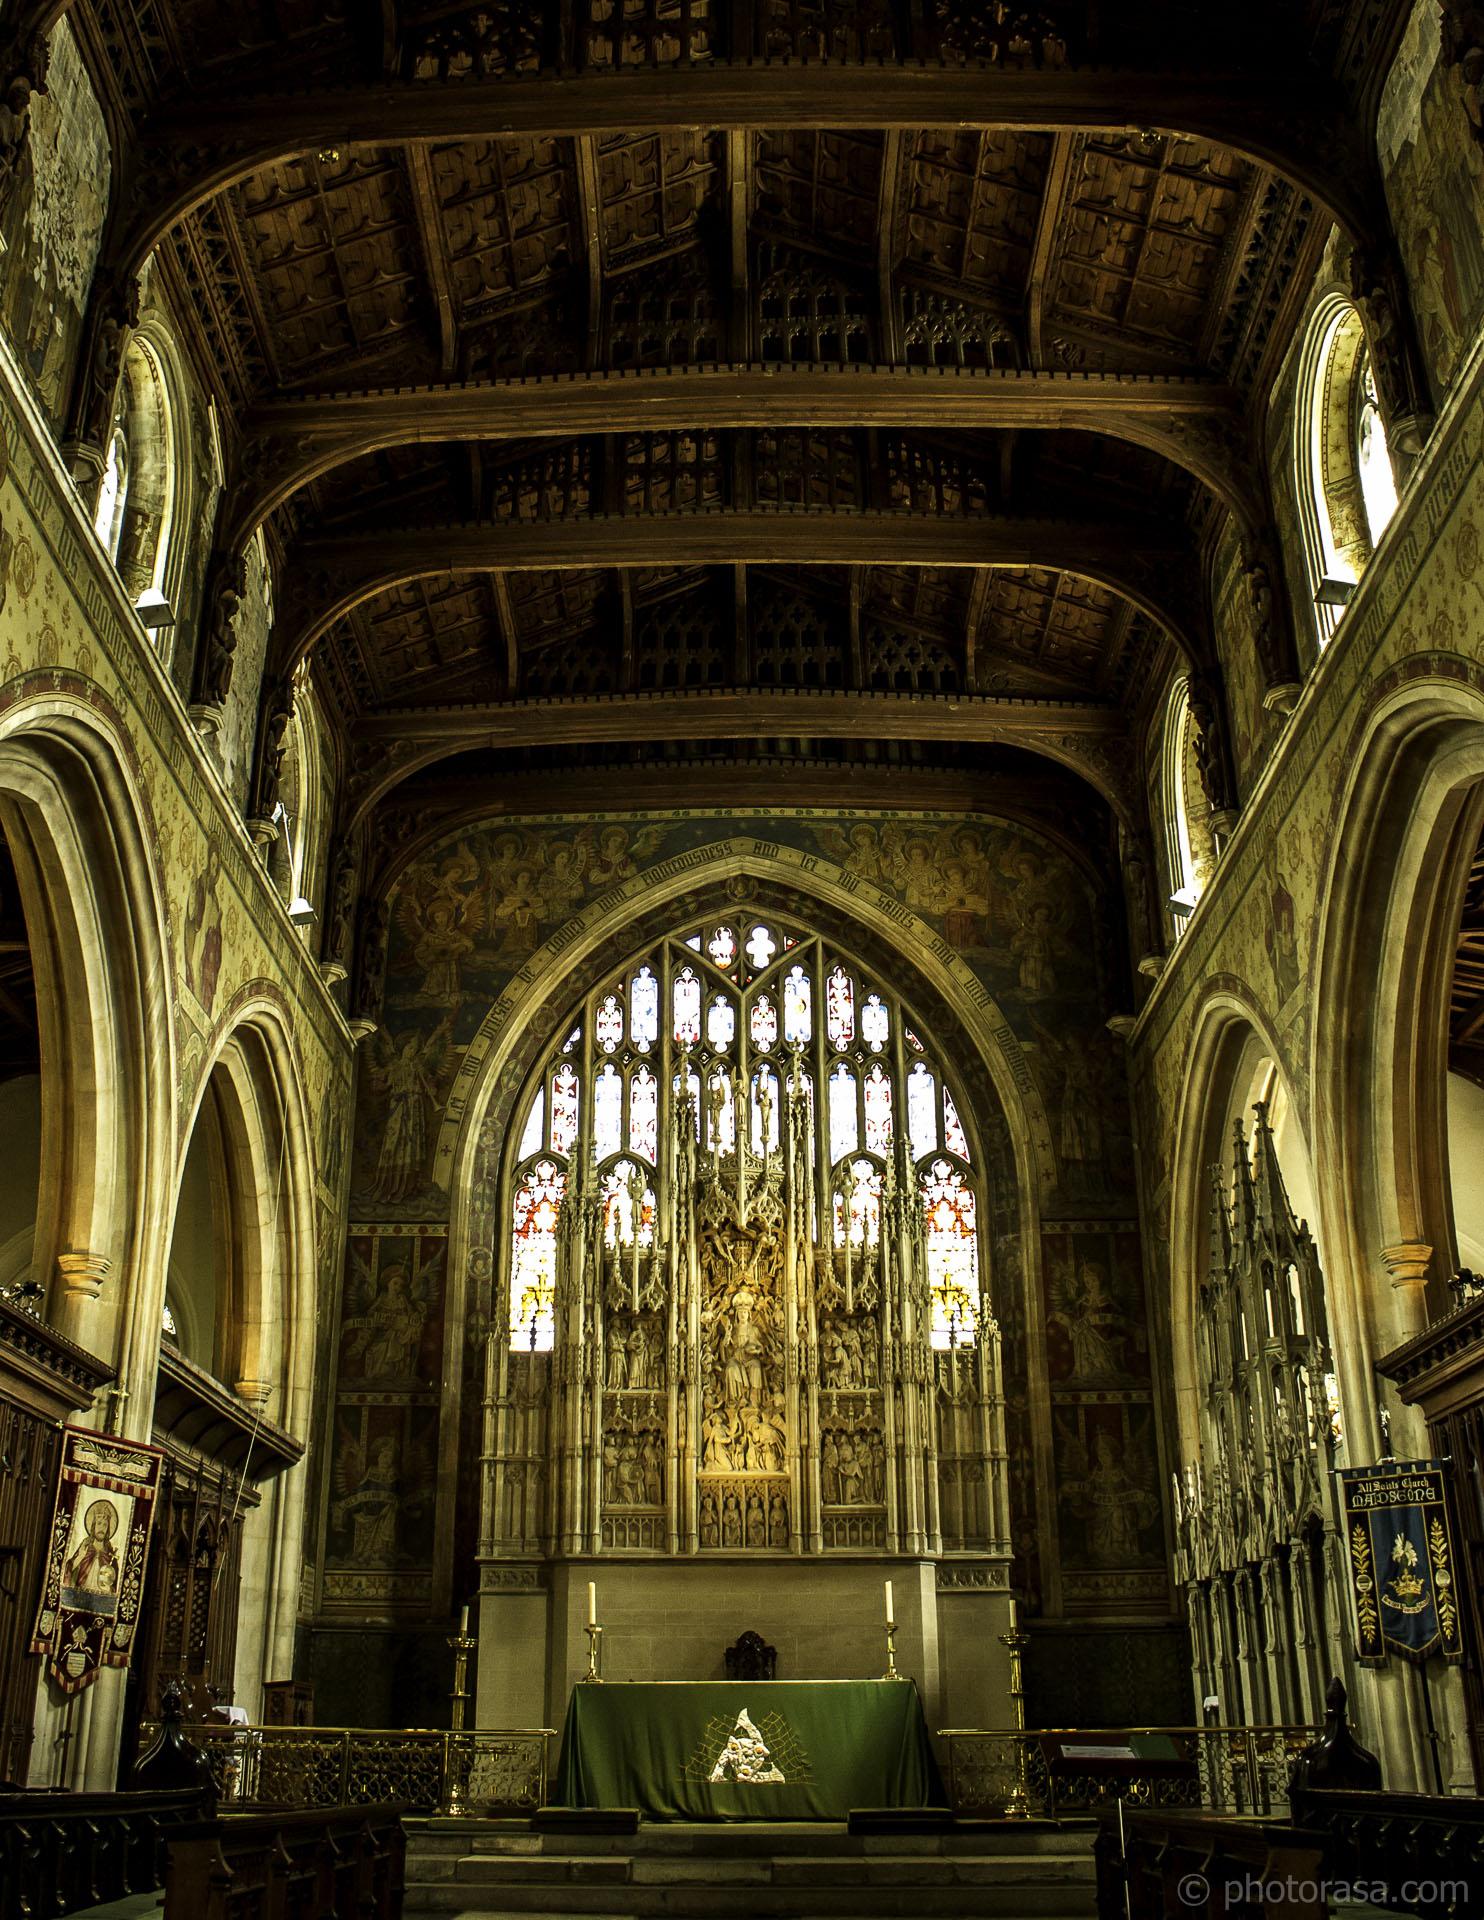 https://photorasa.com/inside-all-saints-church-in-maidstone/all-saints-sanctuary/